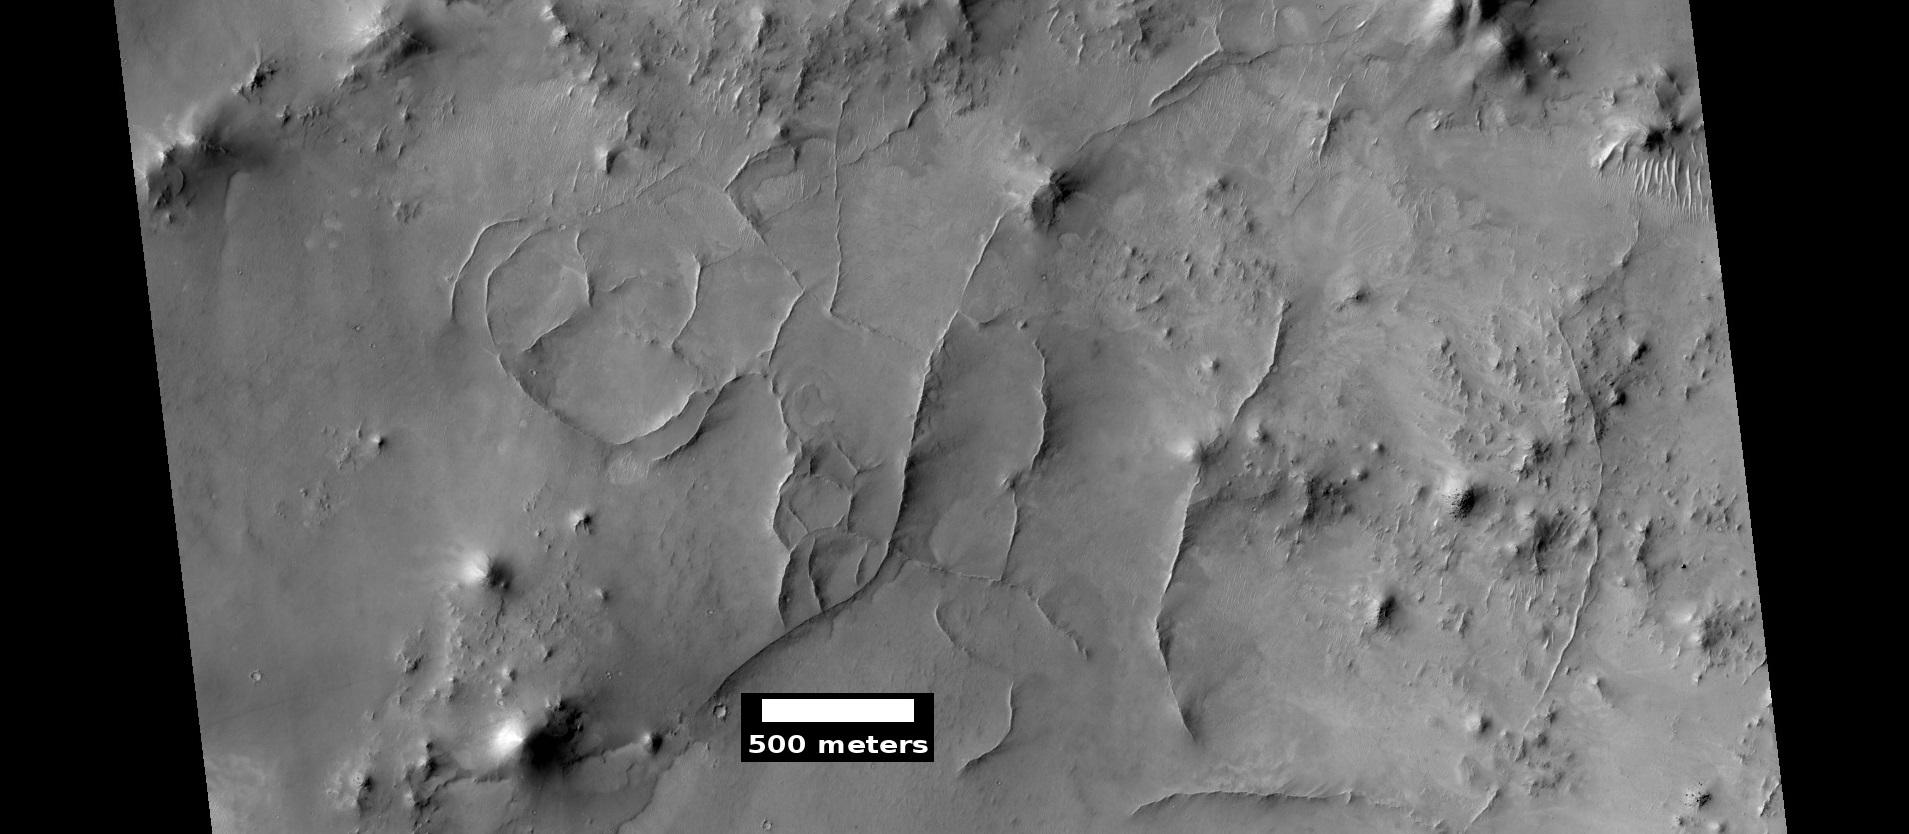 Ridges, as seen by HiRISE under HiWish program